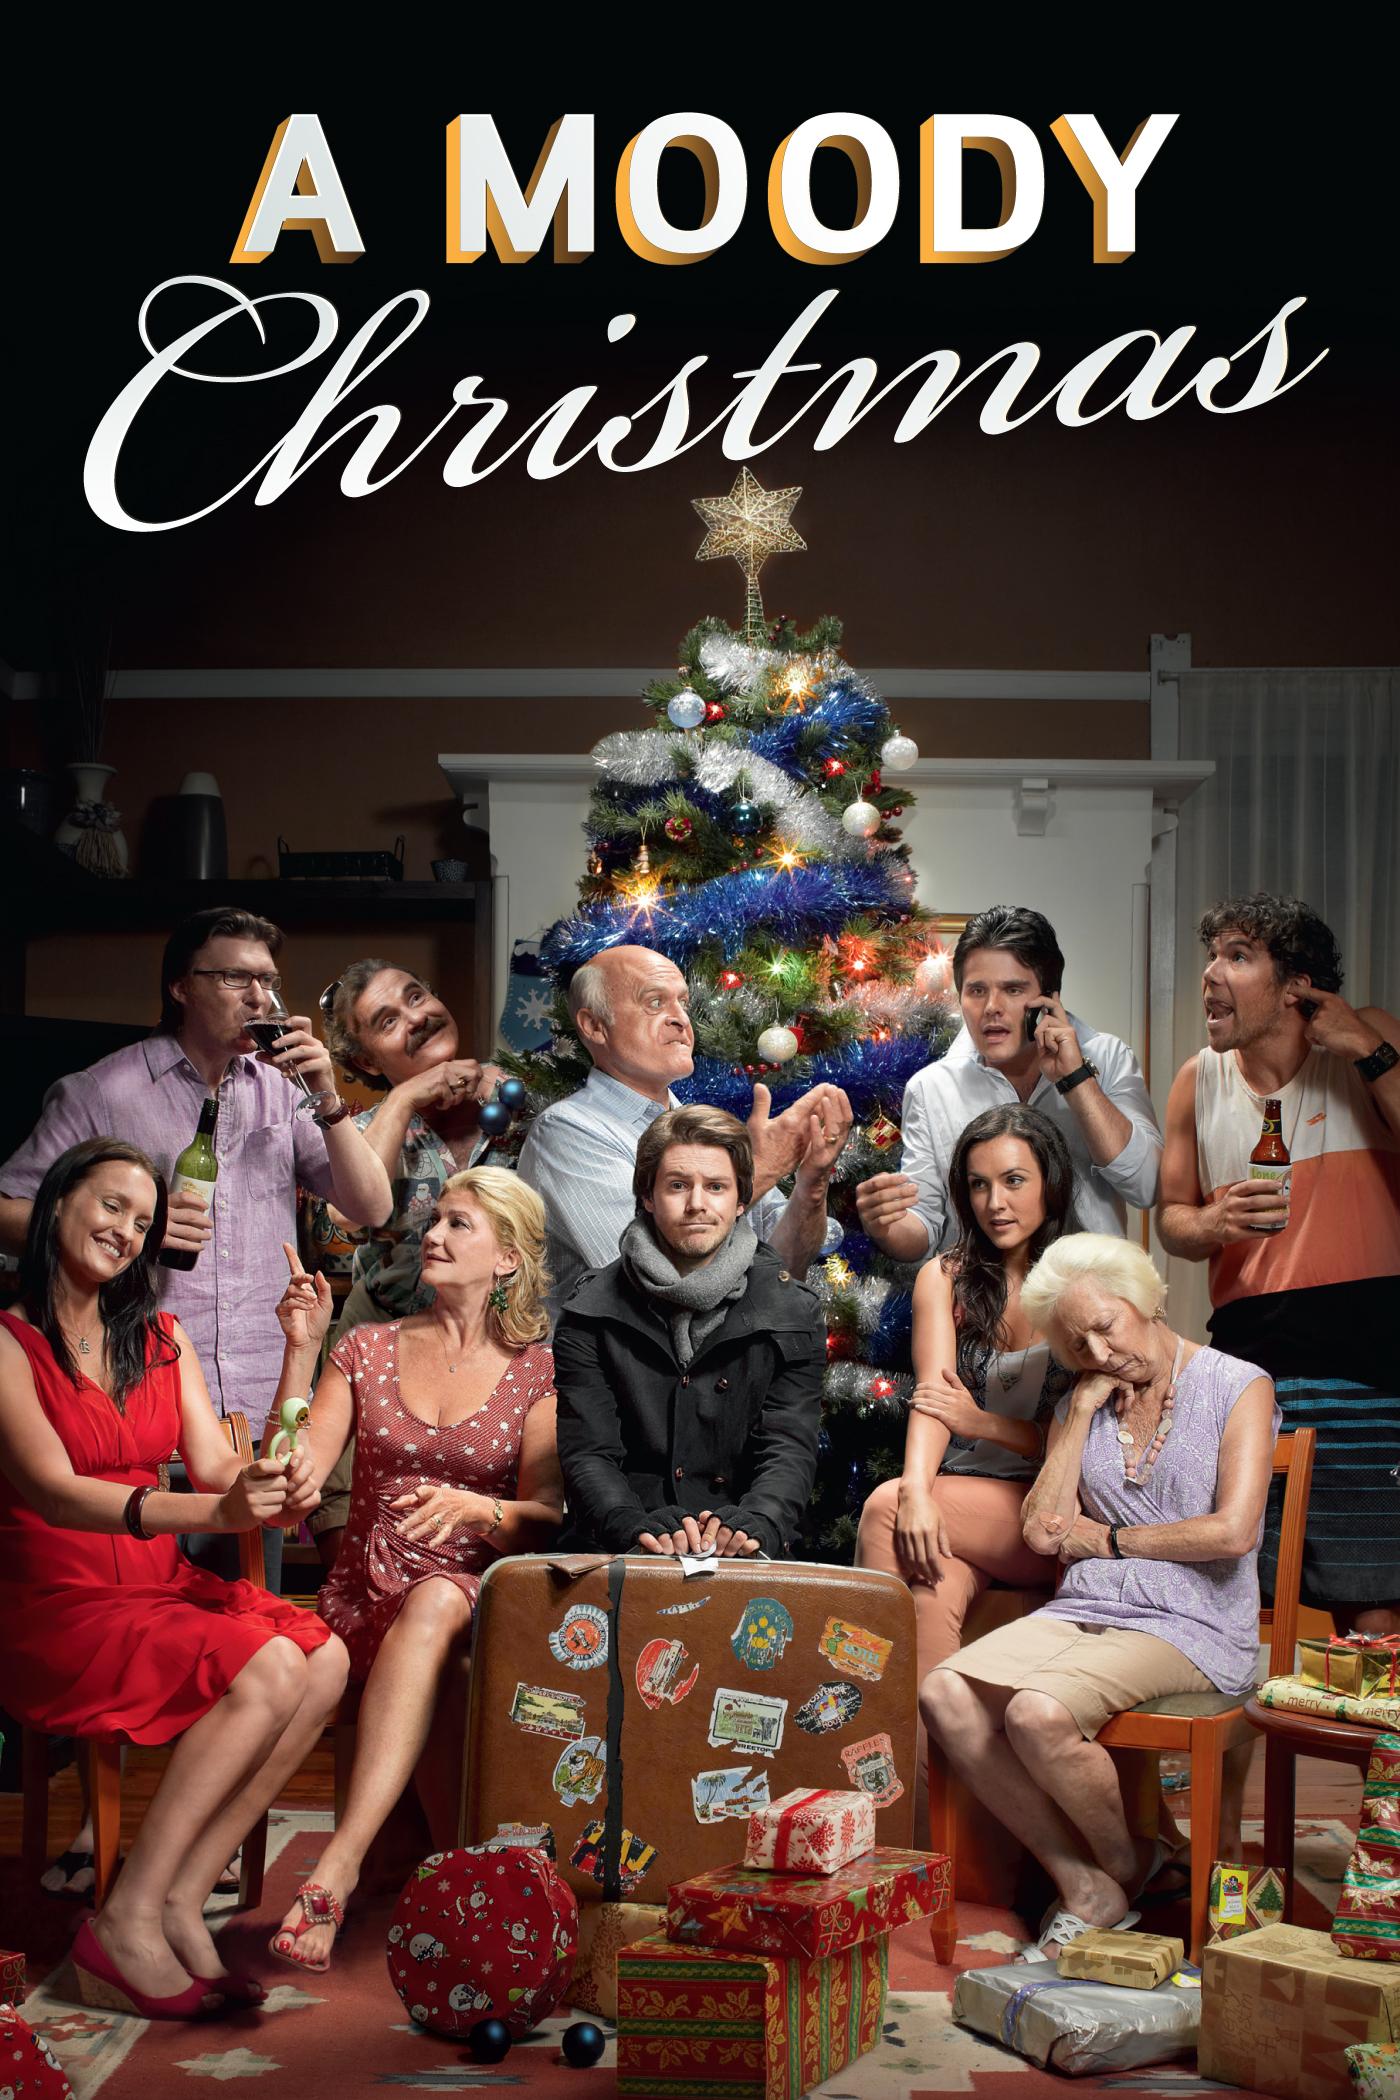 A Moody Christmas (TV Mini-Series 2012) - IMDb